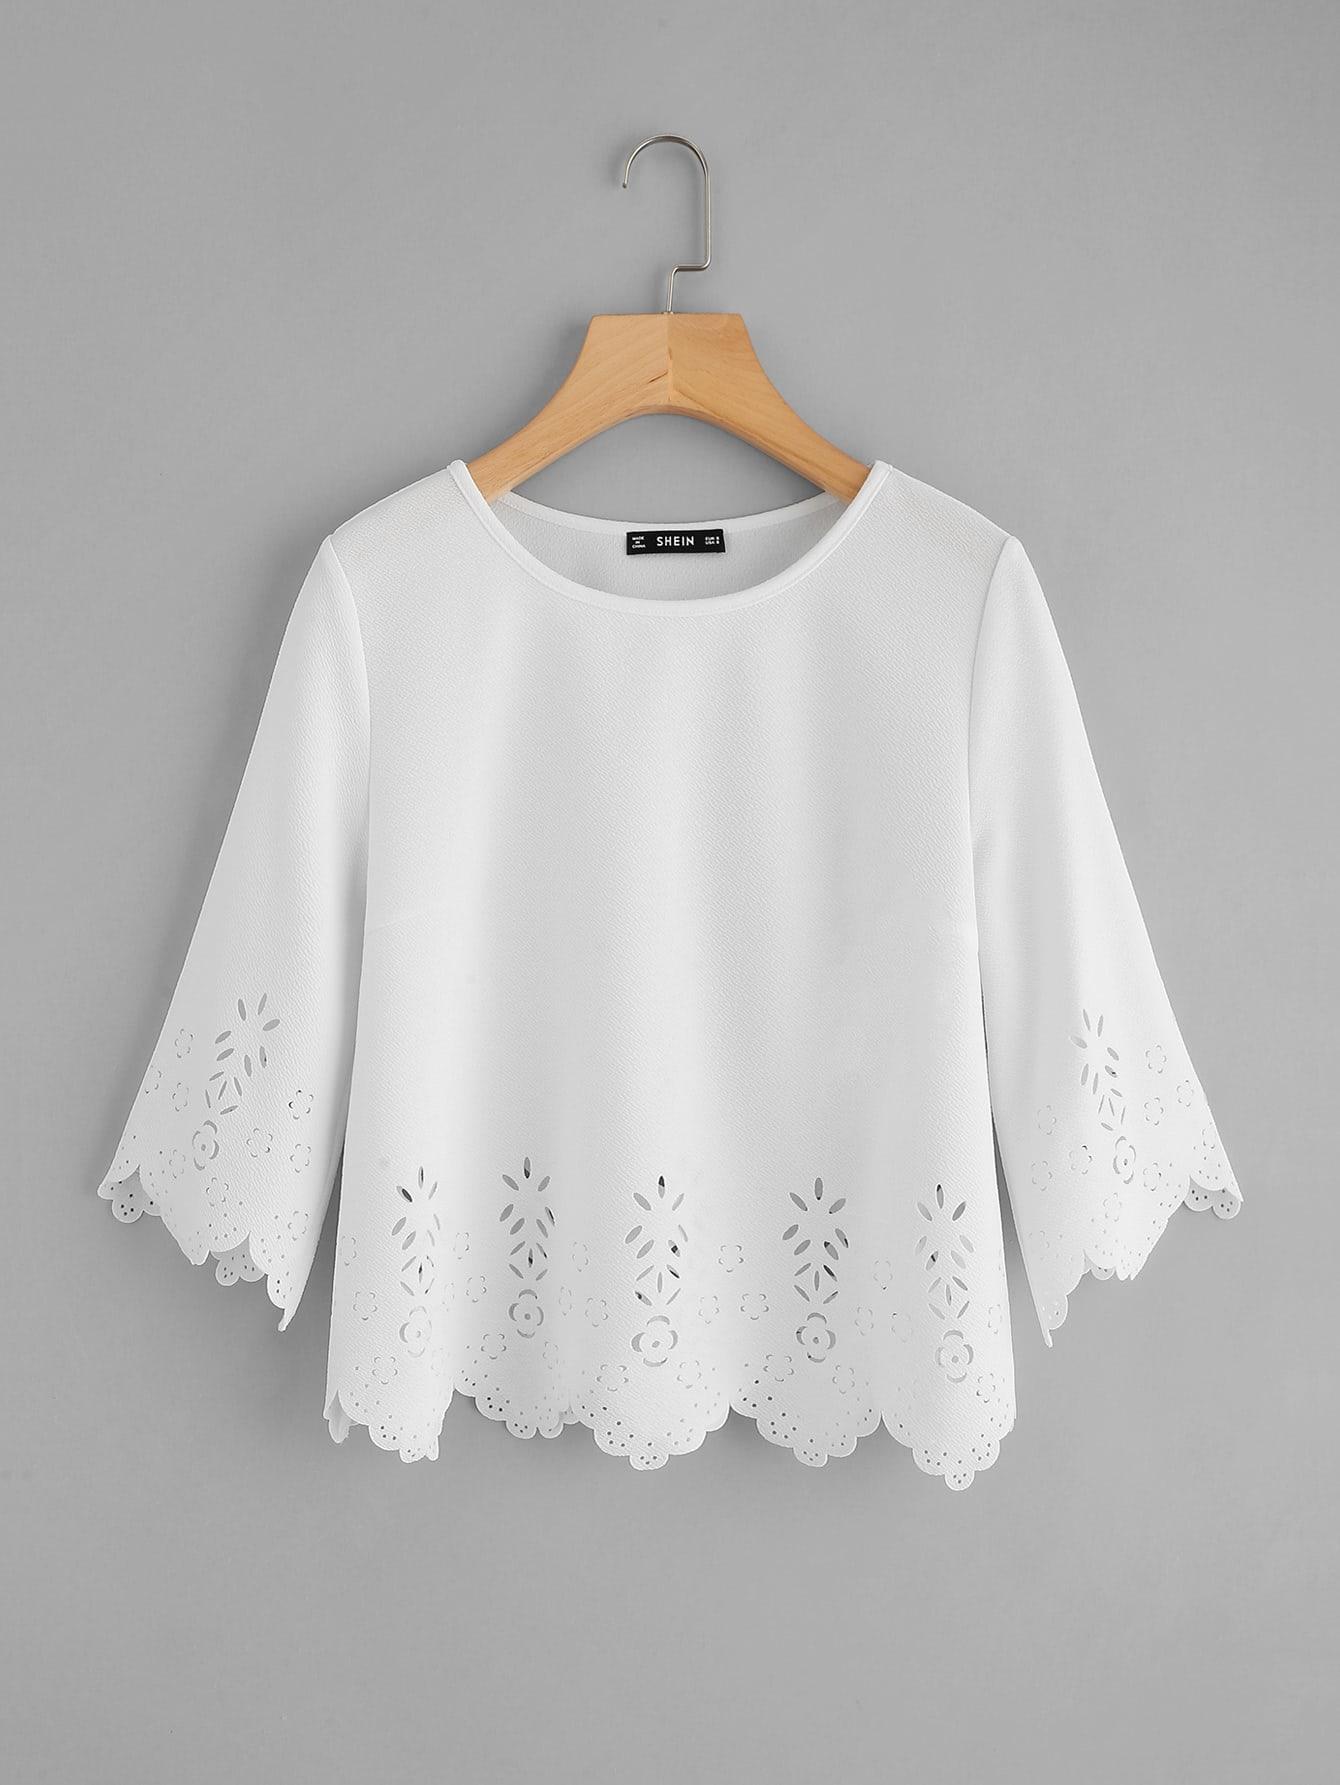 Scallop Laser Cut Textured Top scallop laser cut textured blouse